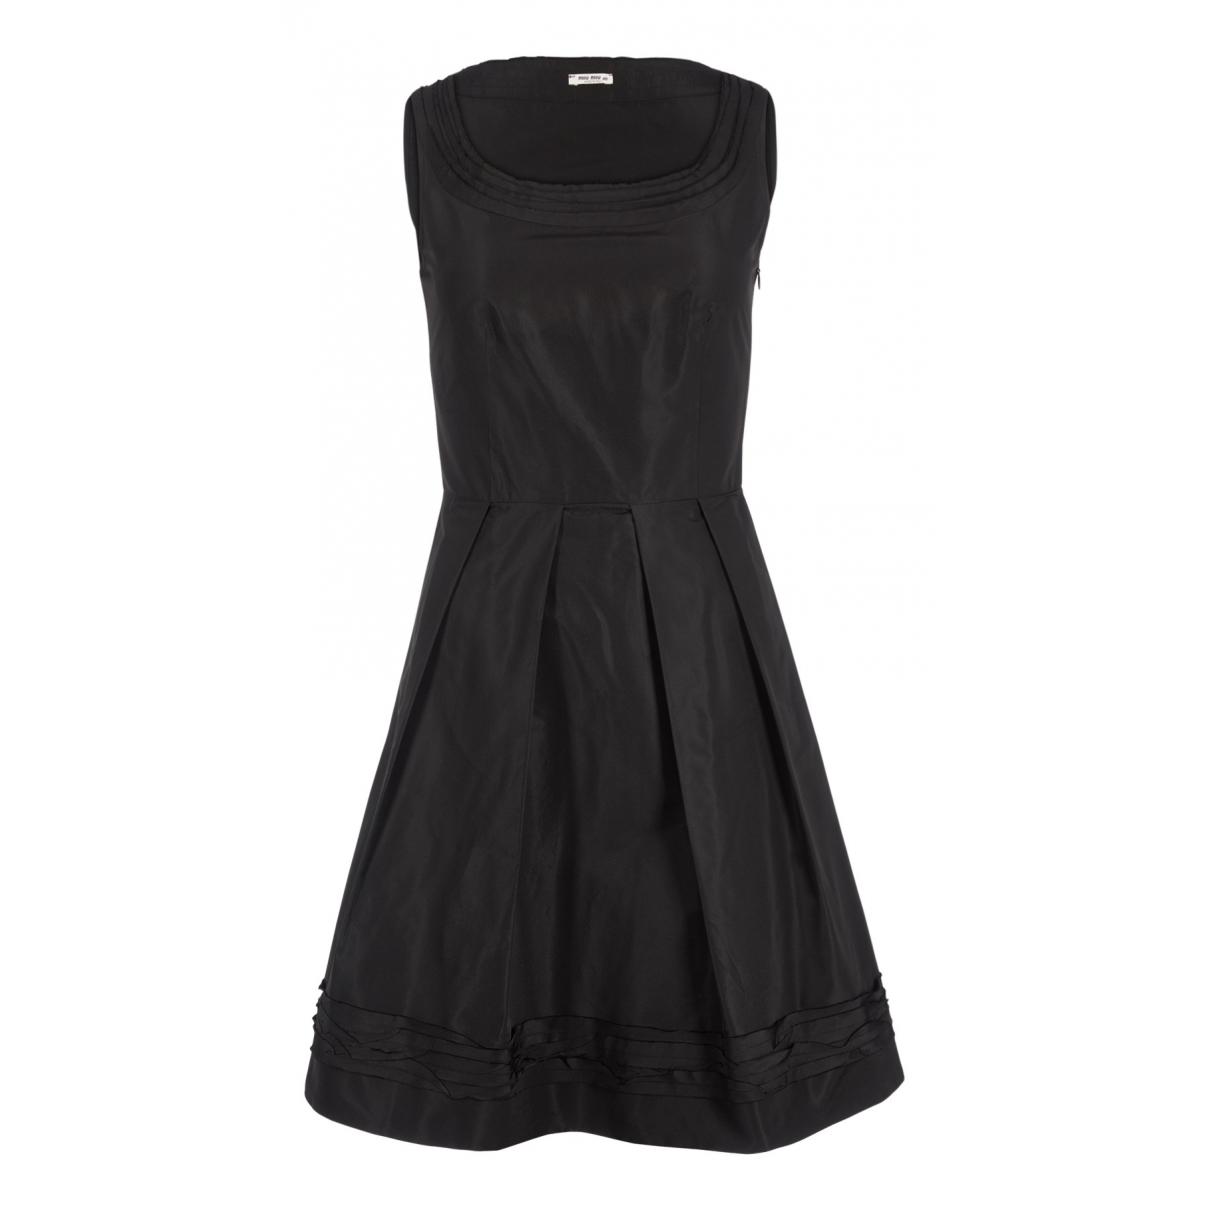 Miu Miu N Black Cotton dress for Women 12 UK